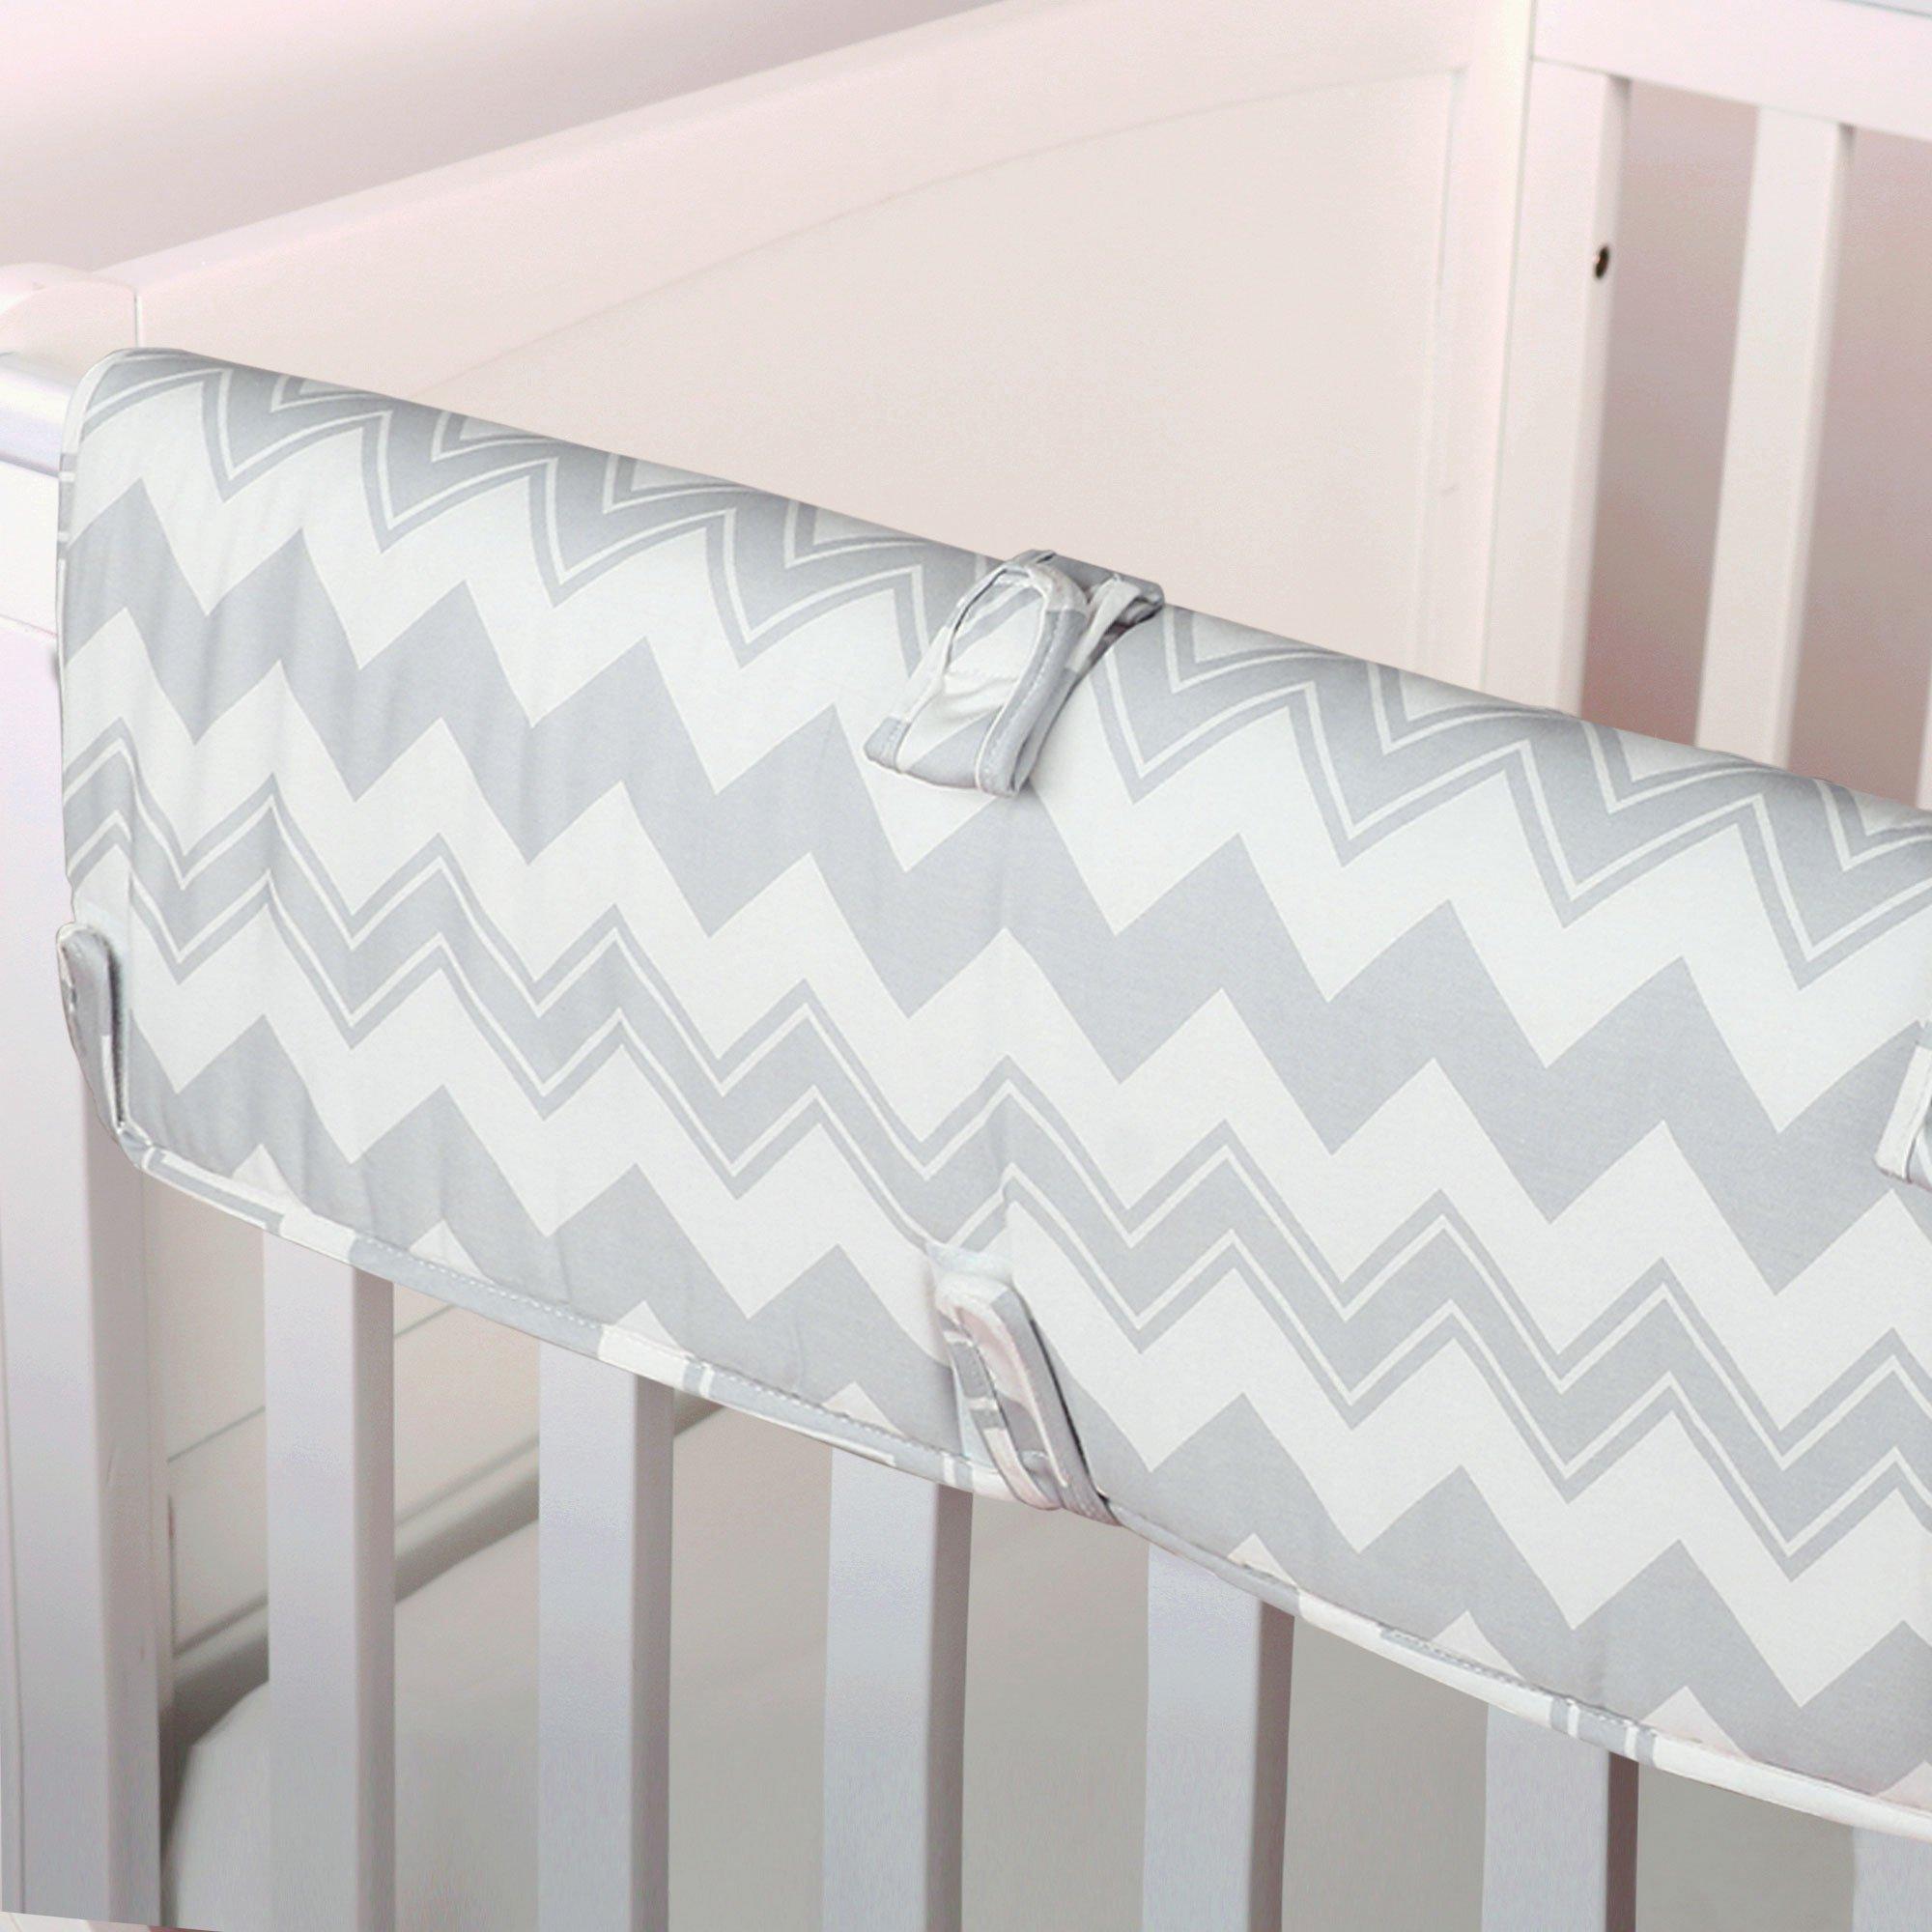 Grey Zig Zag Print 100% Cotton Padded Crib Rail Guard by The Peanut Shell by The Peanut Shell